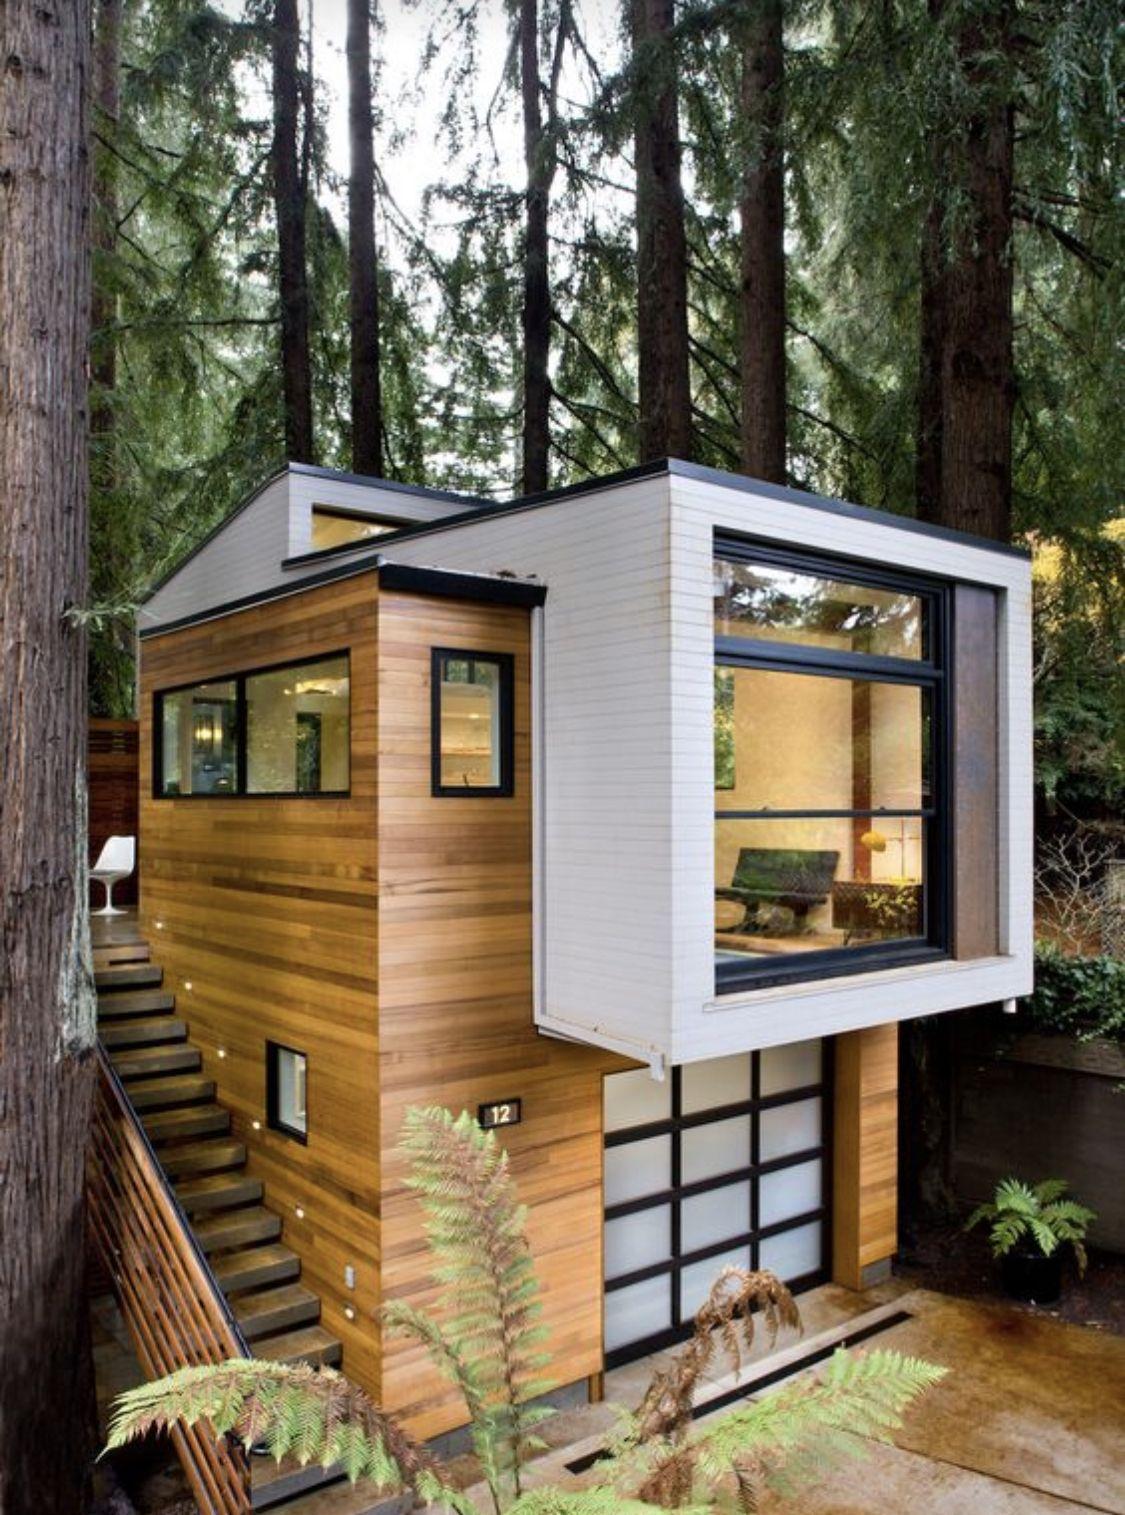 Pin By Natalie Baumgartner On Tiny Houses In 2020 Tiny House